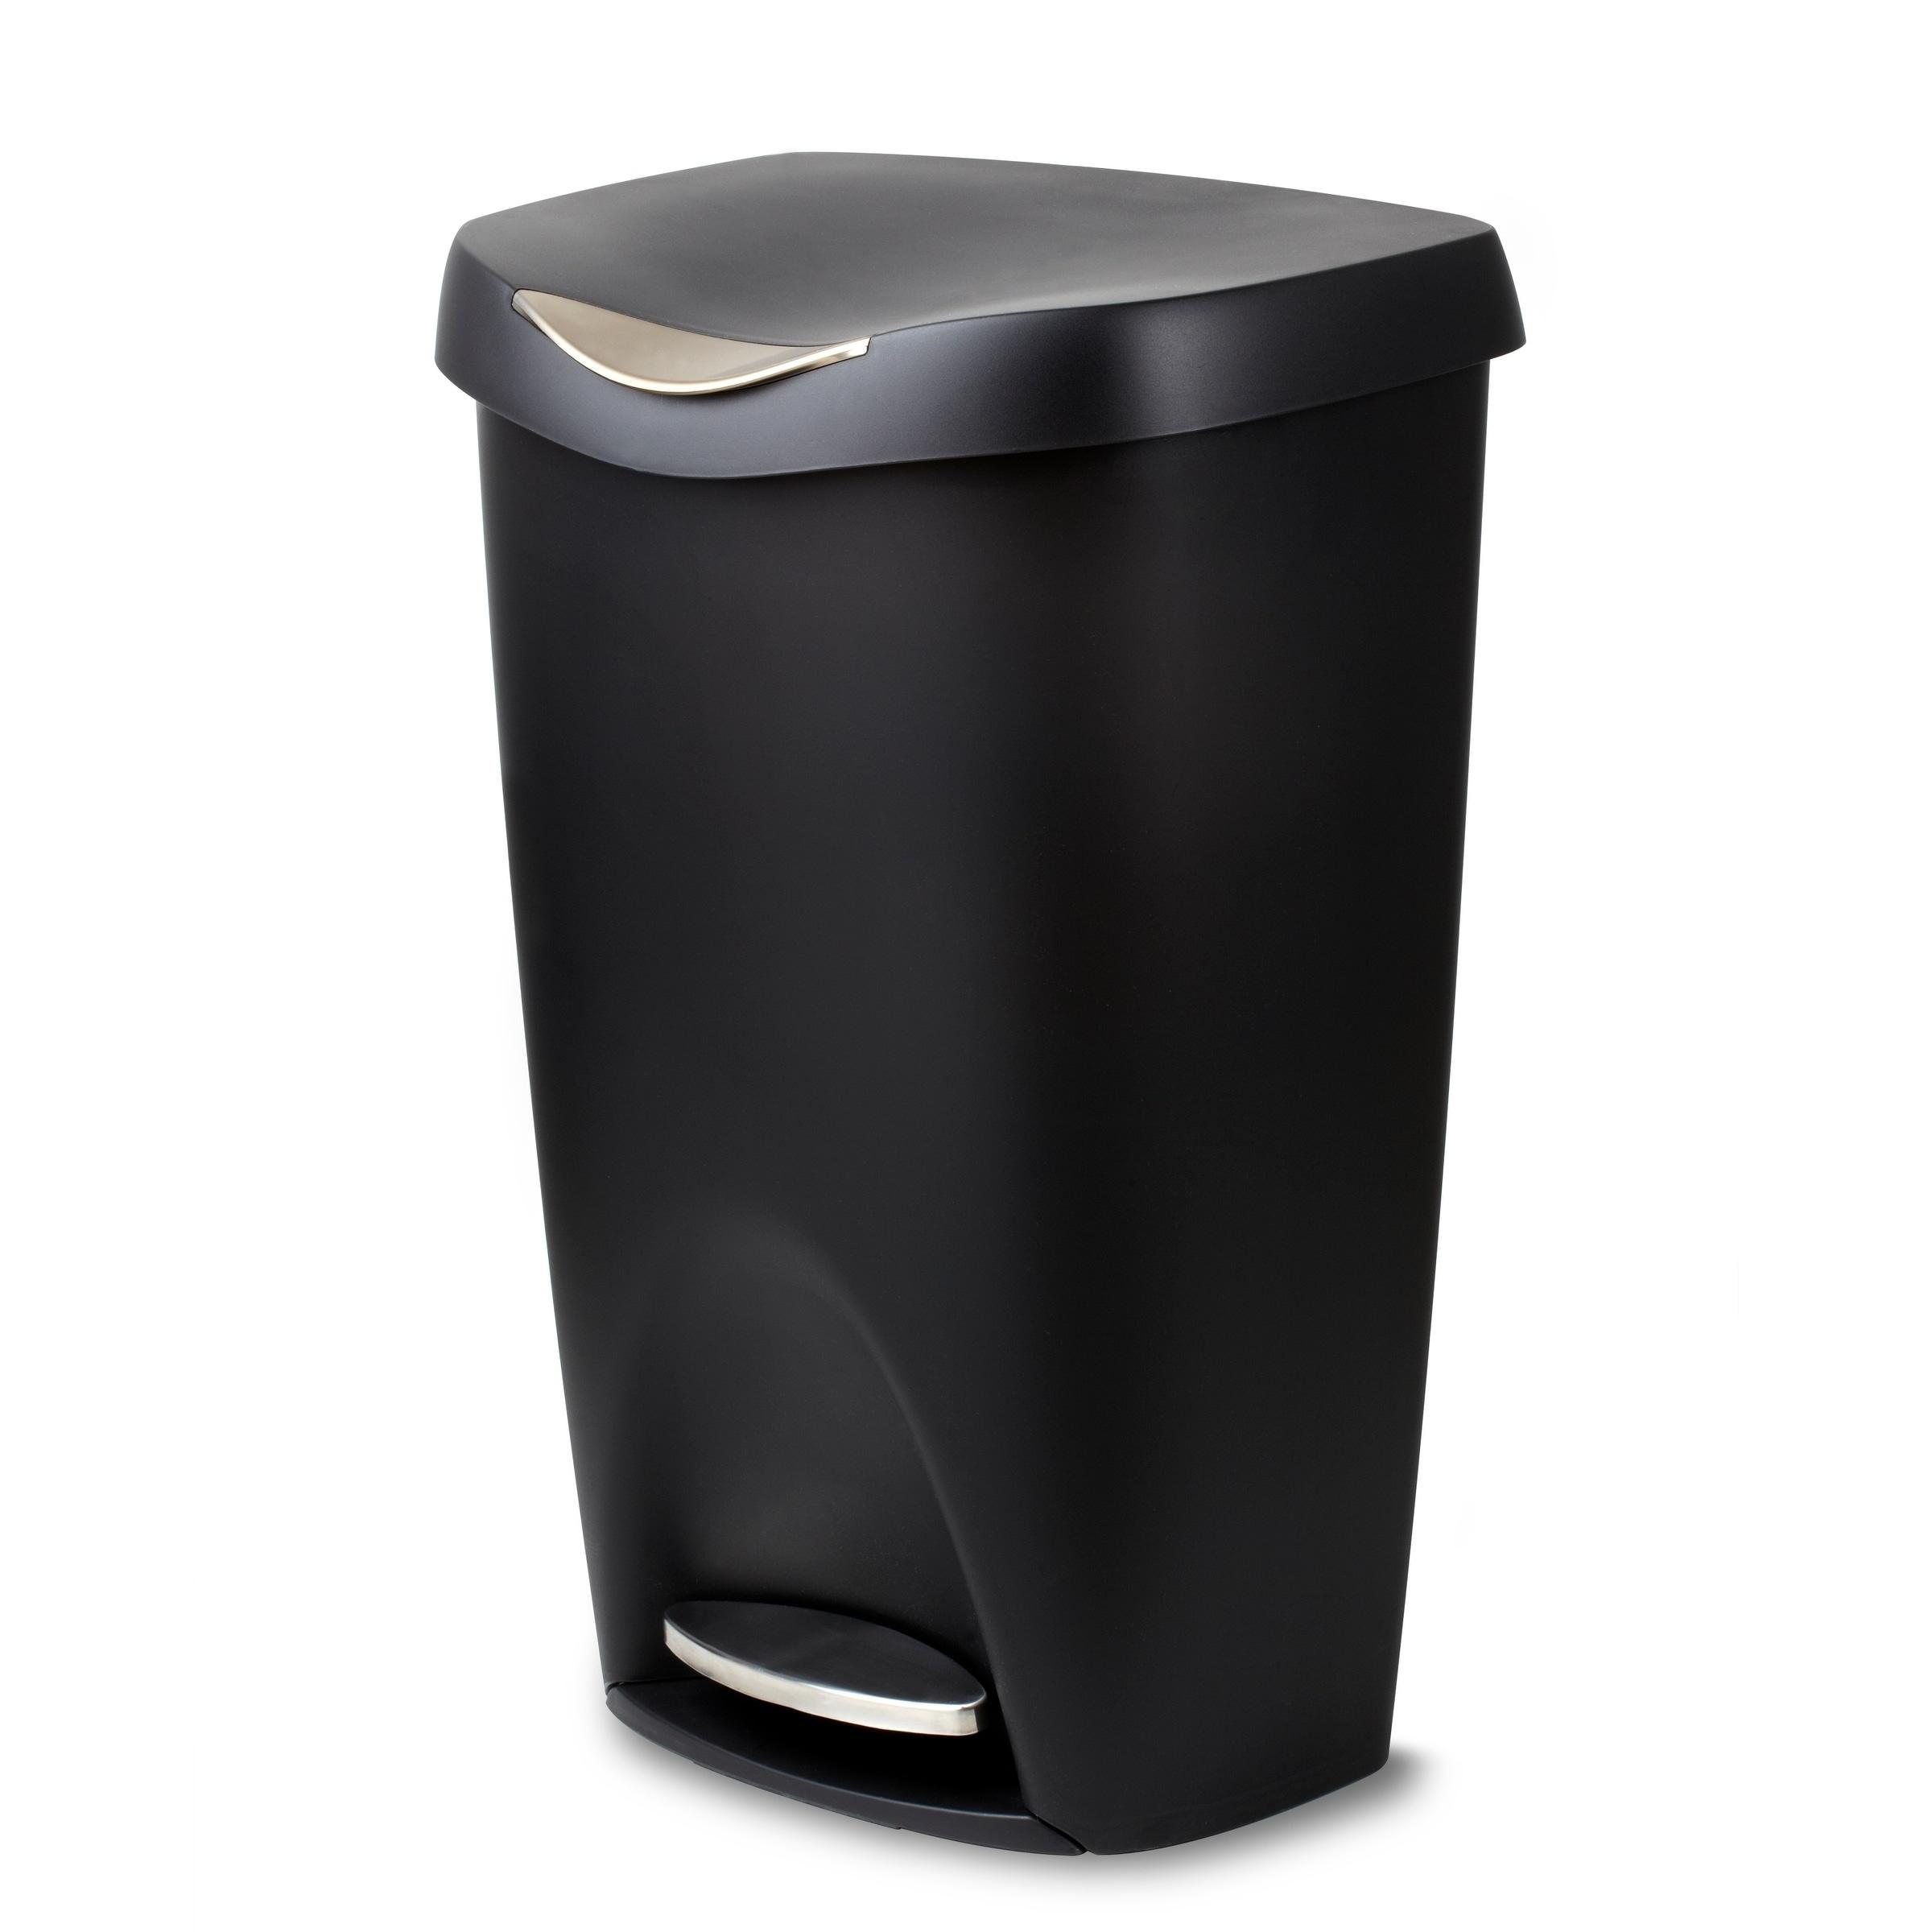 Umbra Brim Large 13 Gallon Trash Can